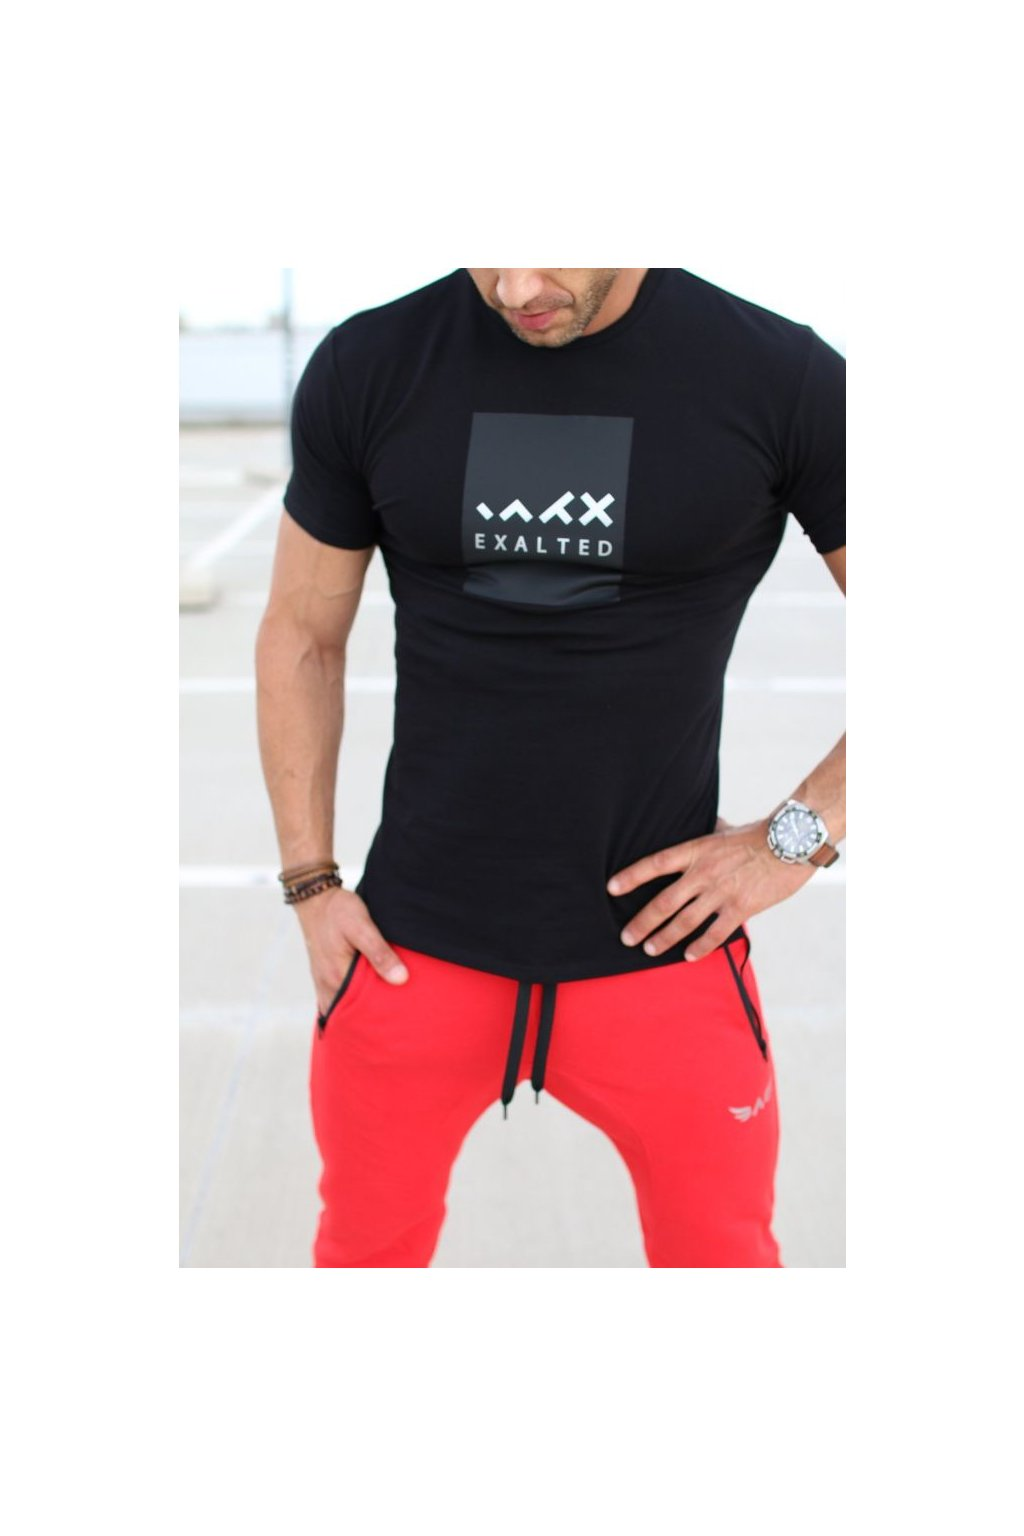 Pánské tričko Exalted E1- Černé